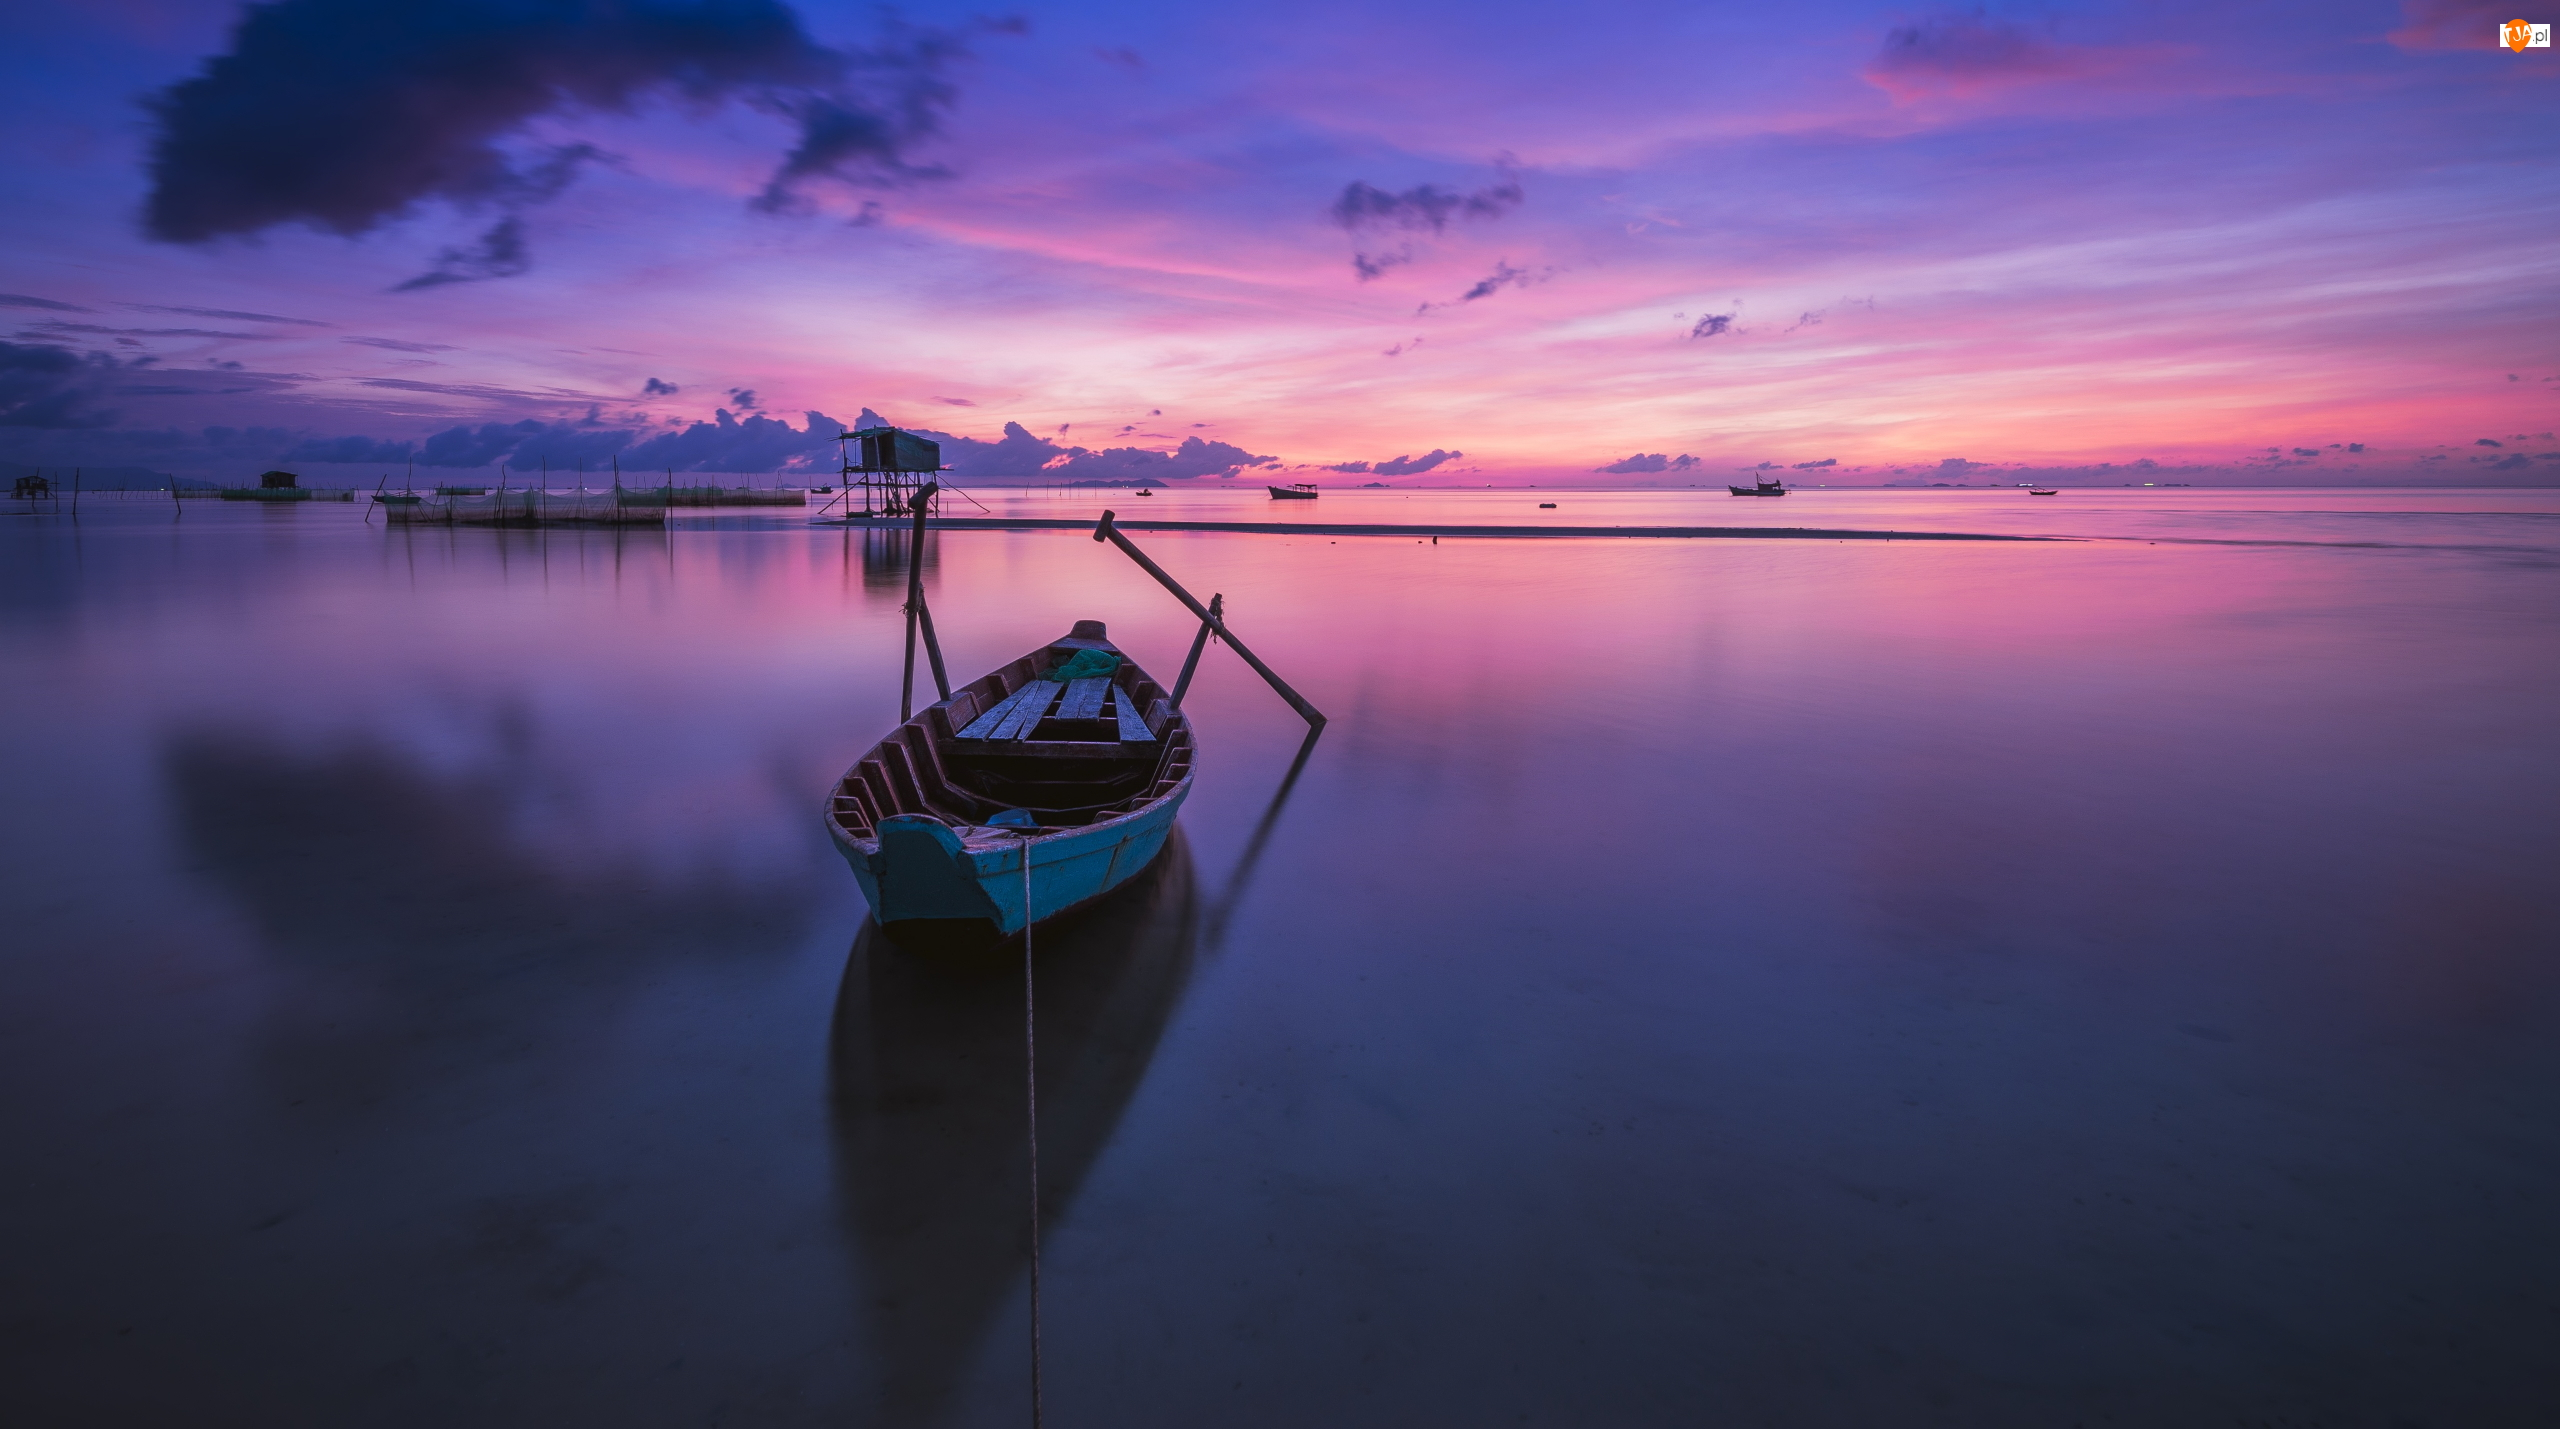 Łódka, Morze, Zachód słońca